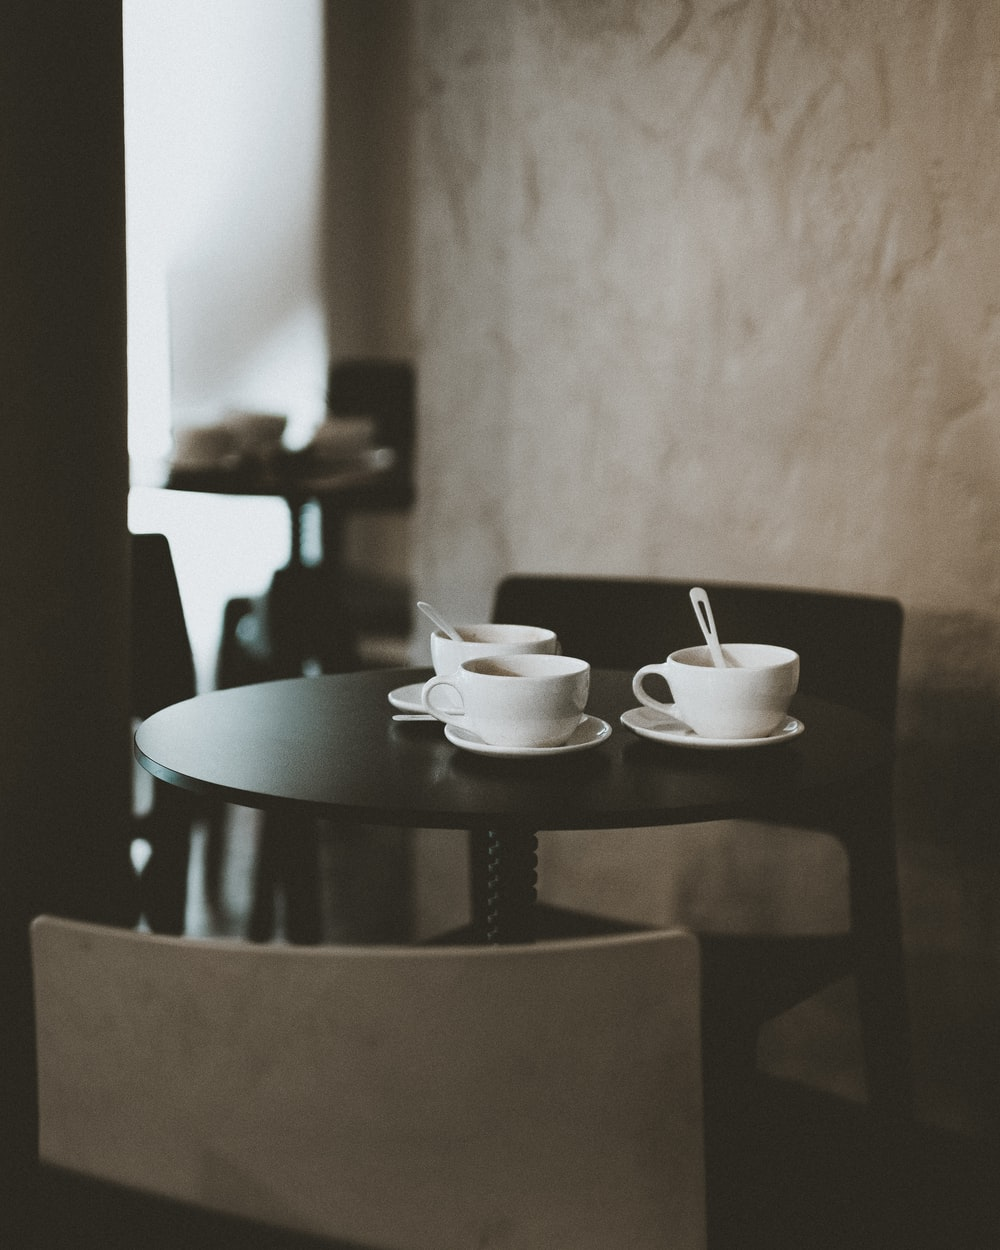 three white ceramic teacups on black wooden table